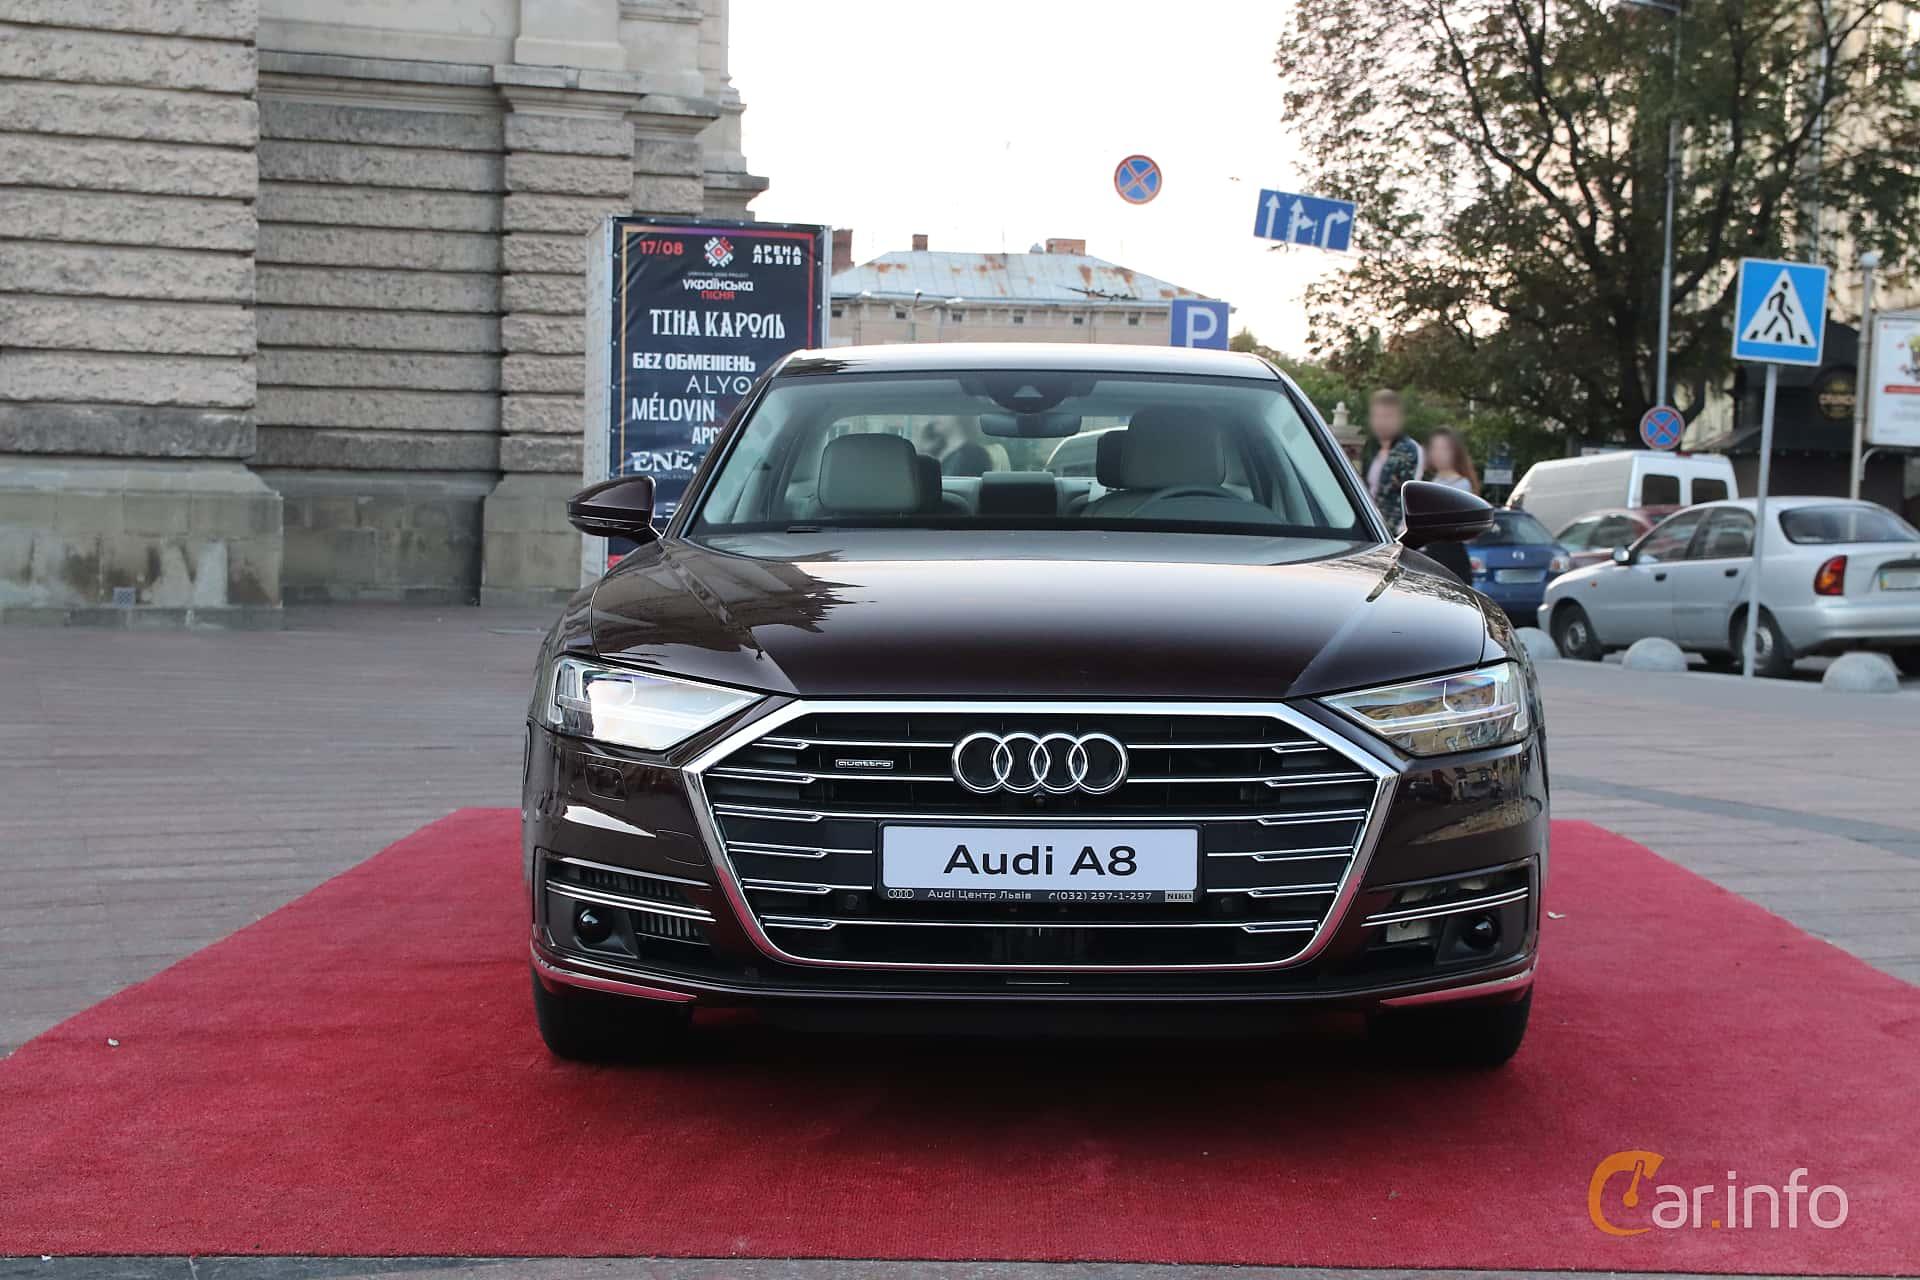 Audi A8 50 TDI quattro  TipTronic, 286hp, 2019